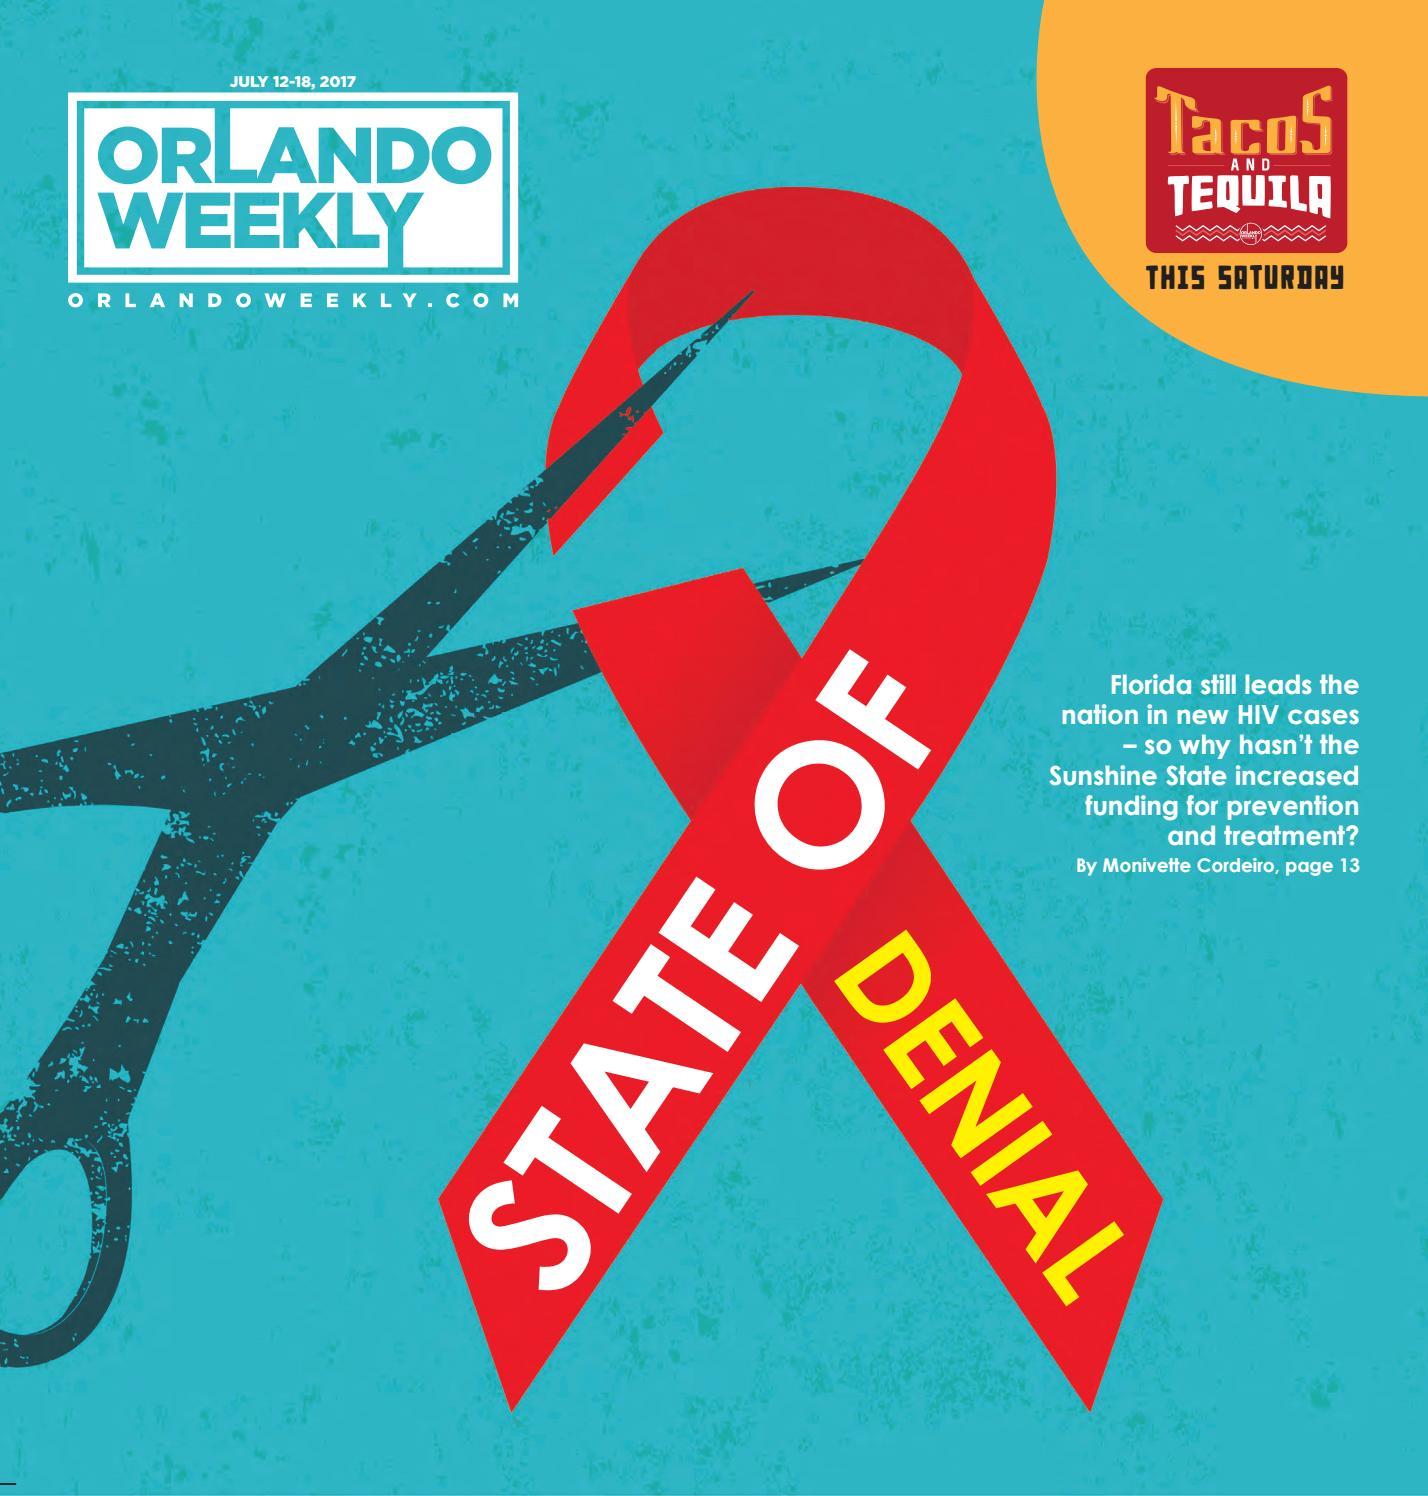 Orlando Weekly July 12 2017 by Euclid Media Group - issuu